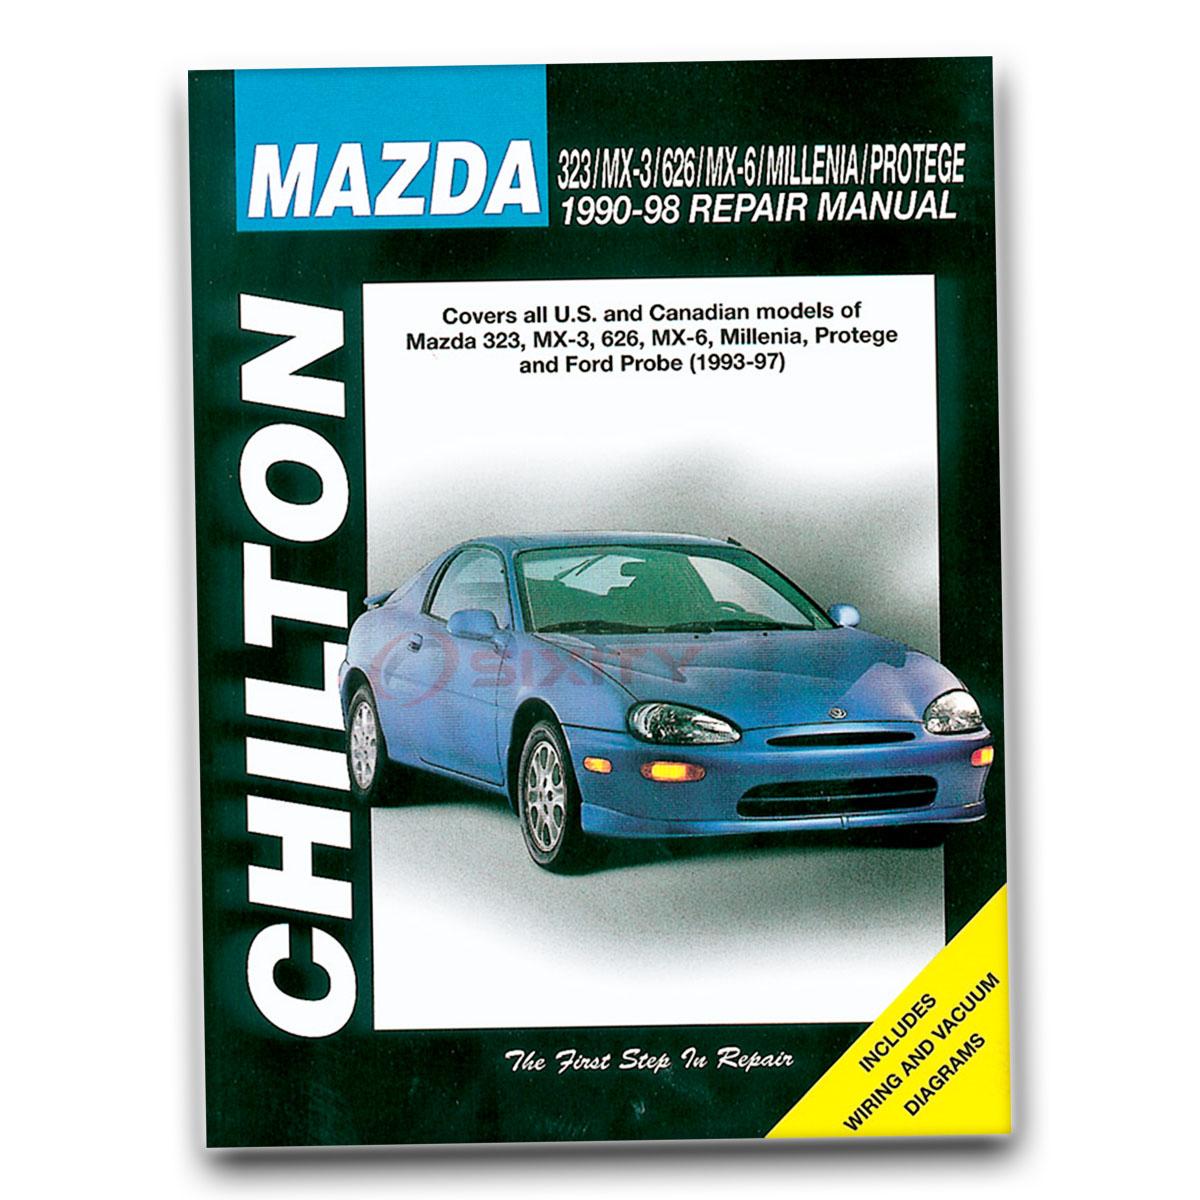 mazda 626 chilton repair manual lx gt le dx es shop service garage rh ebay com 2012 Mazda 3 2011 Mazda 3